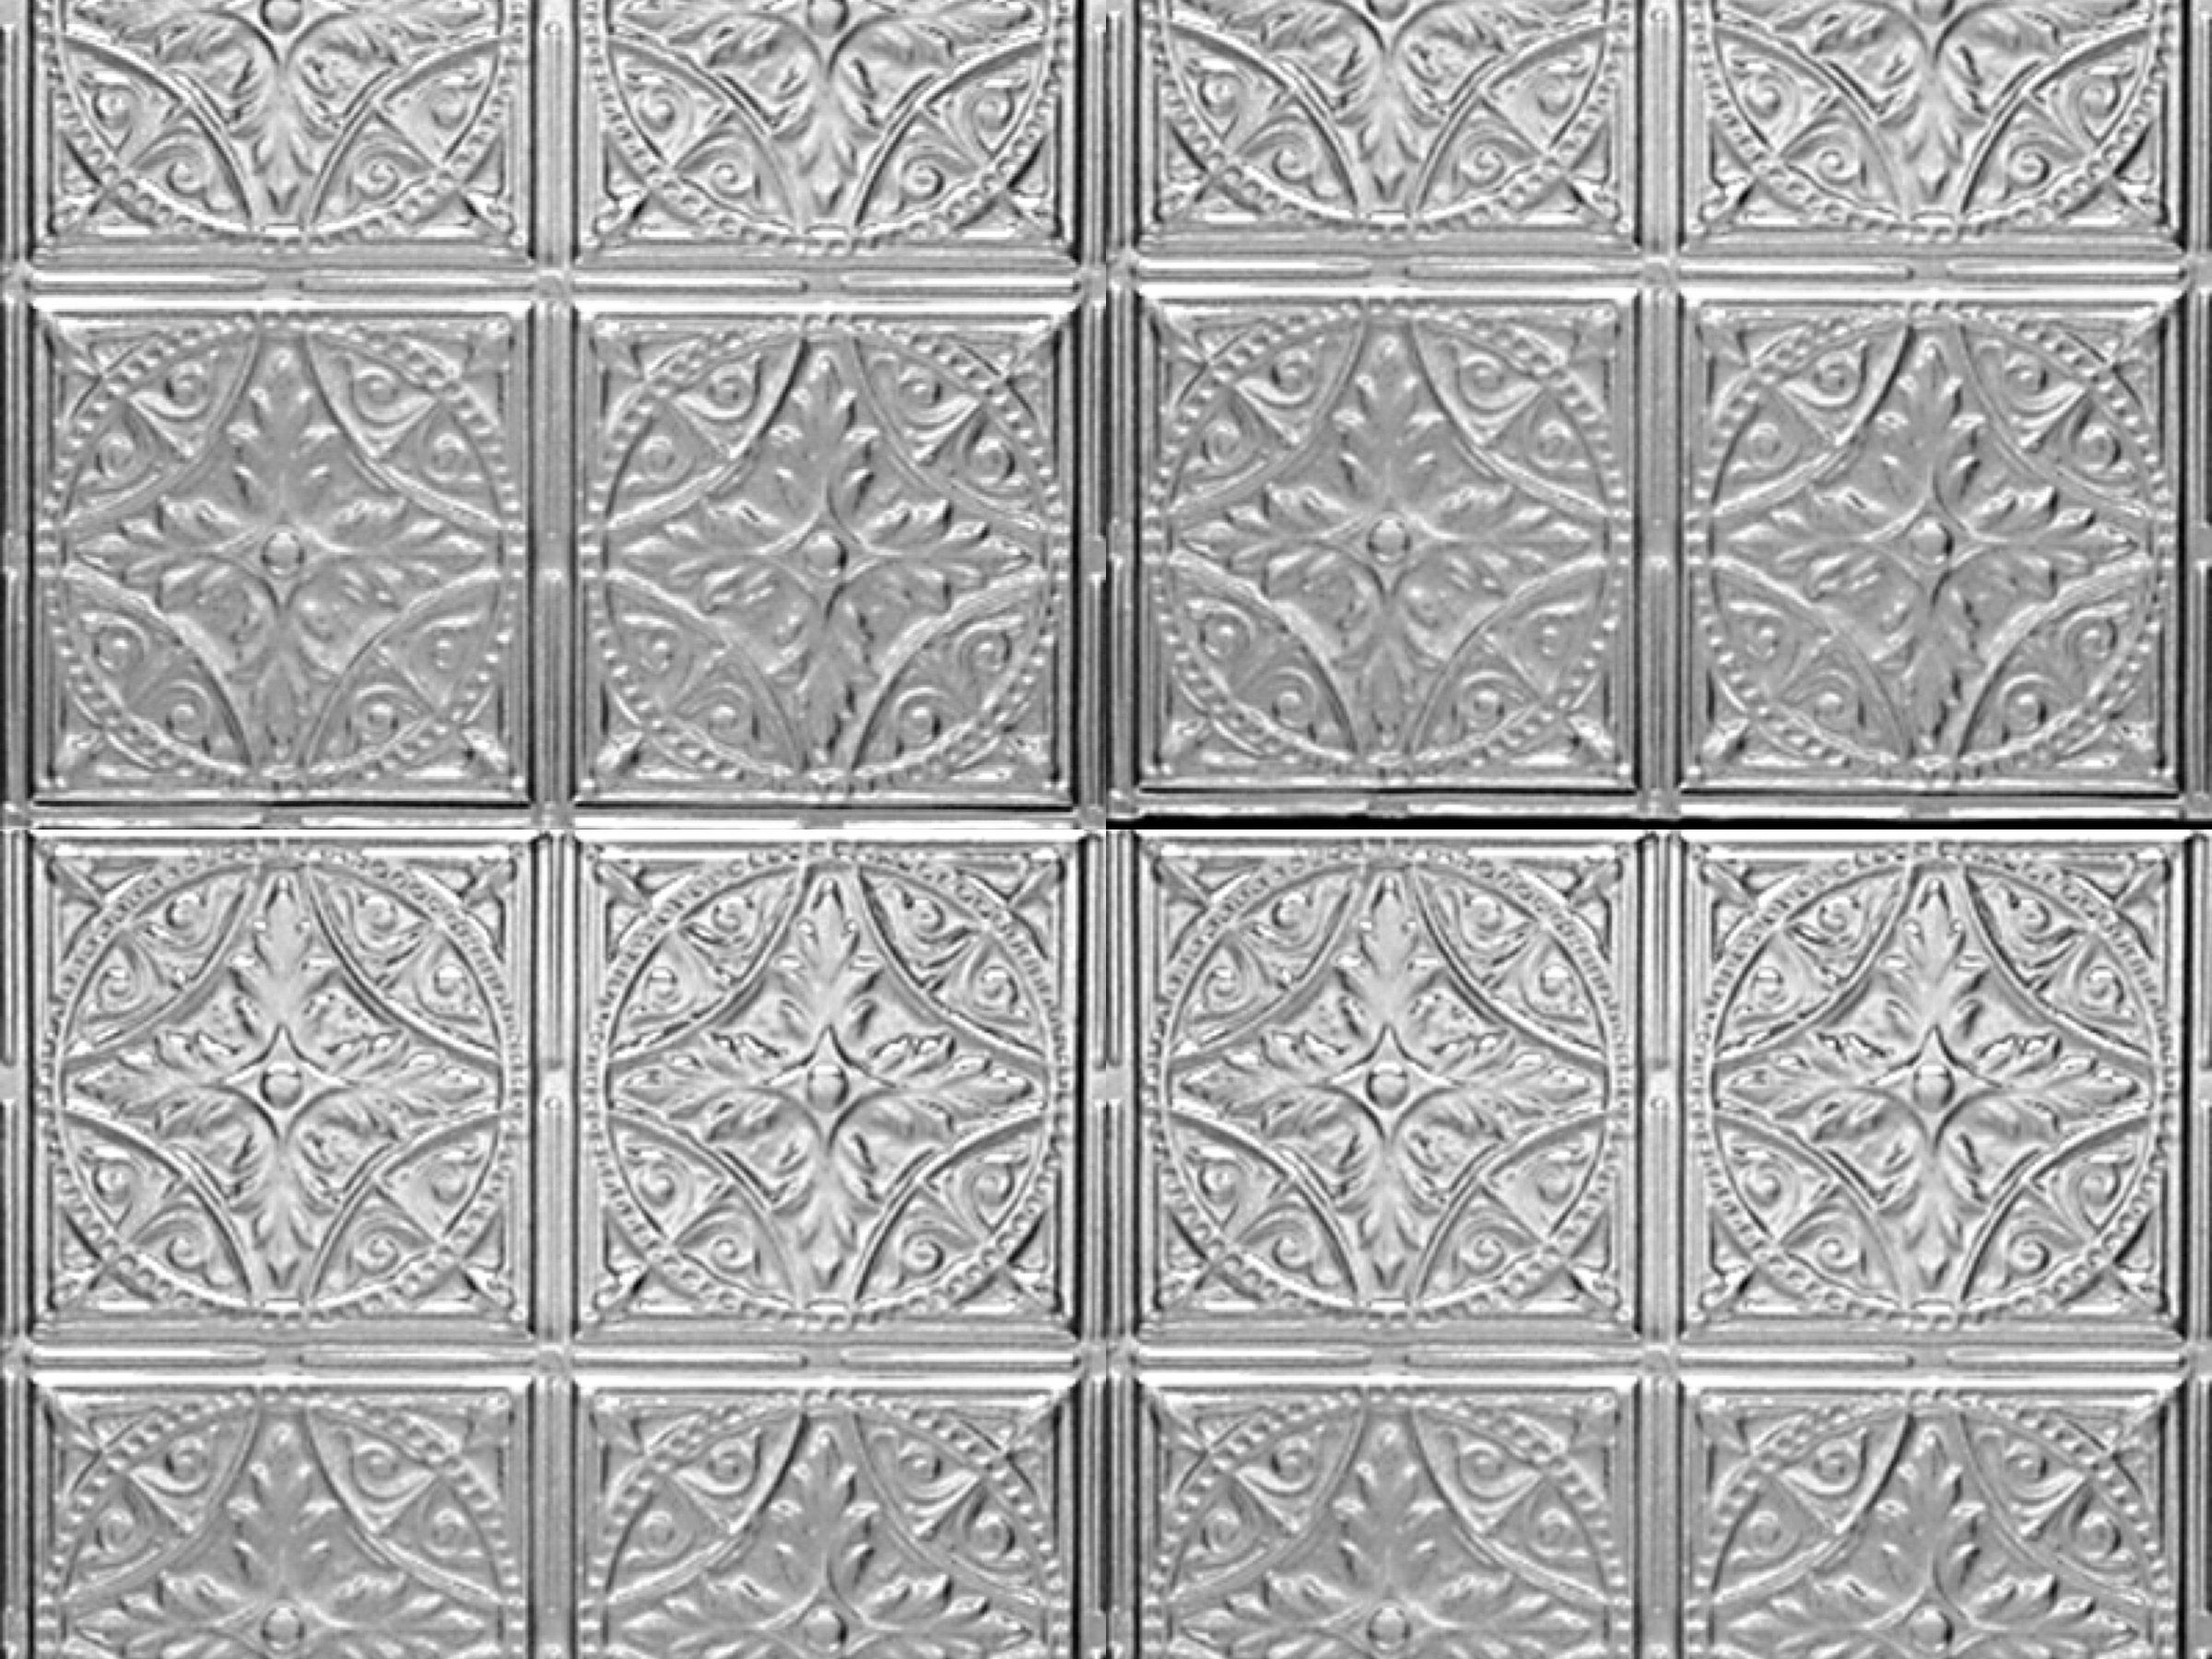 Stainless steel stove fabulous tin backsplash decorative stainless steel stove fabulous tin backsplash decorative ceiling tiles kitchen update fauxtintiles dailygadgetfo Choice Image